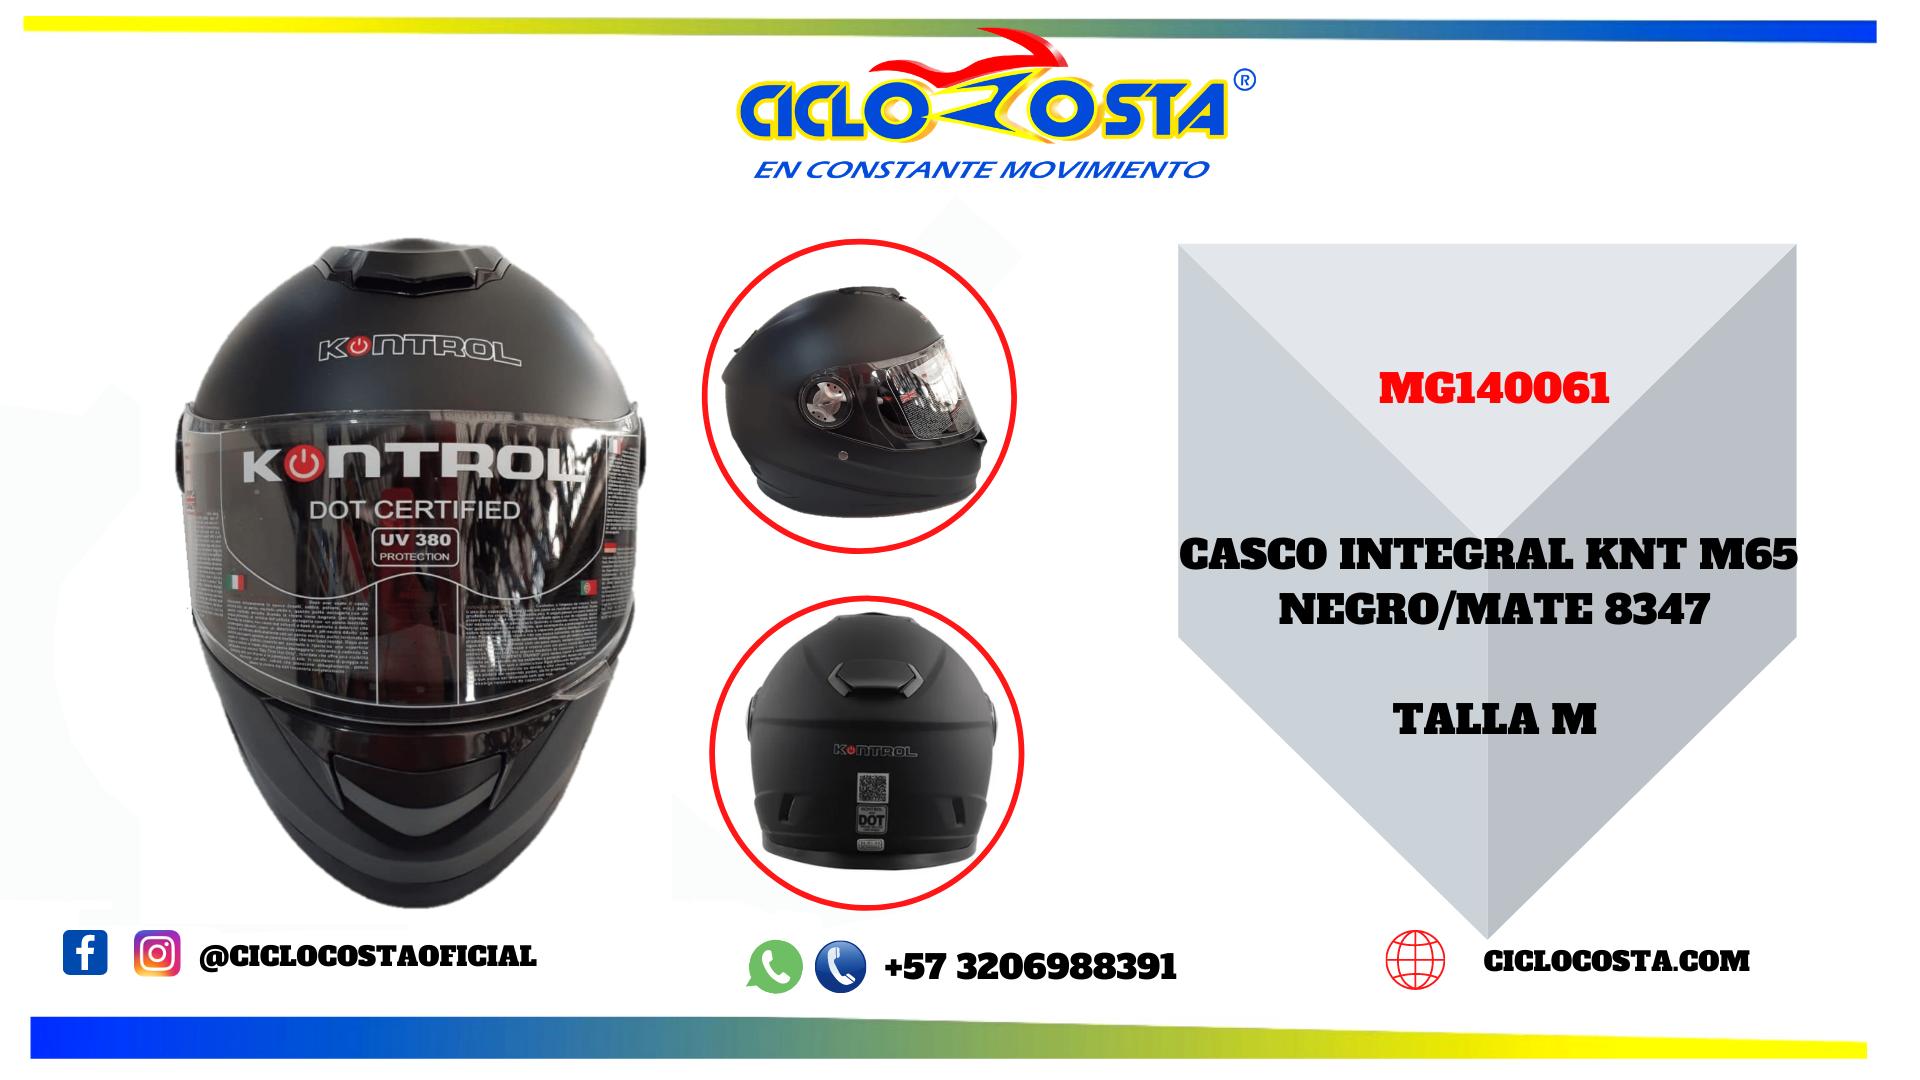 MG140061 CASCO INTEGRAL